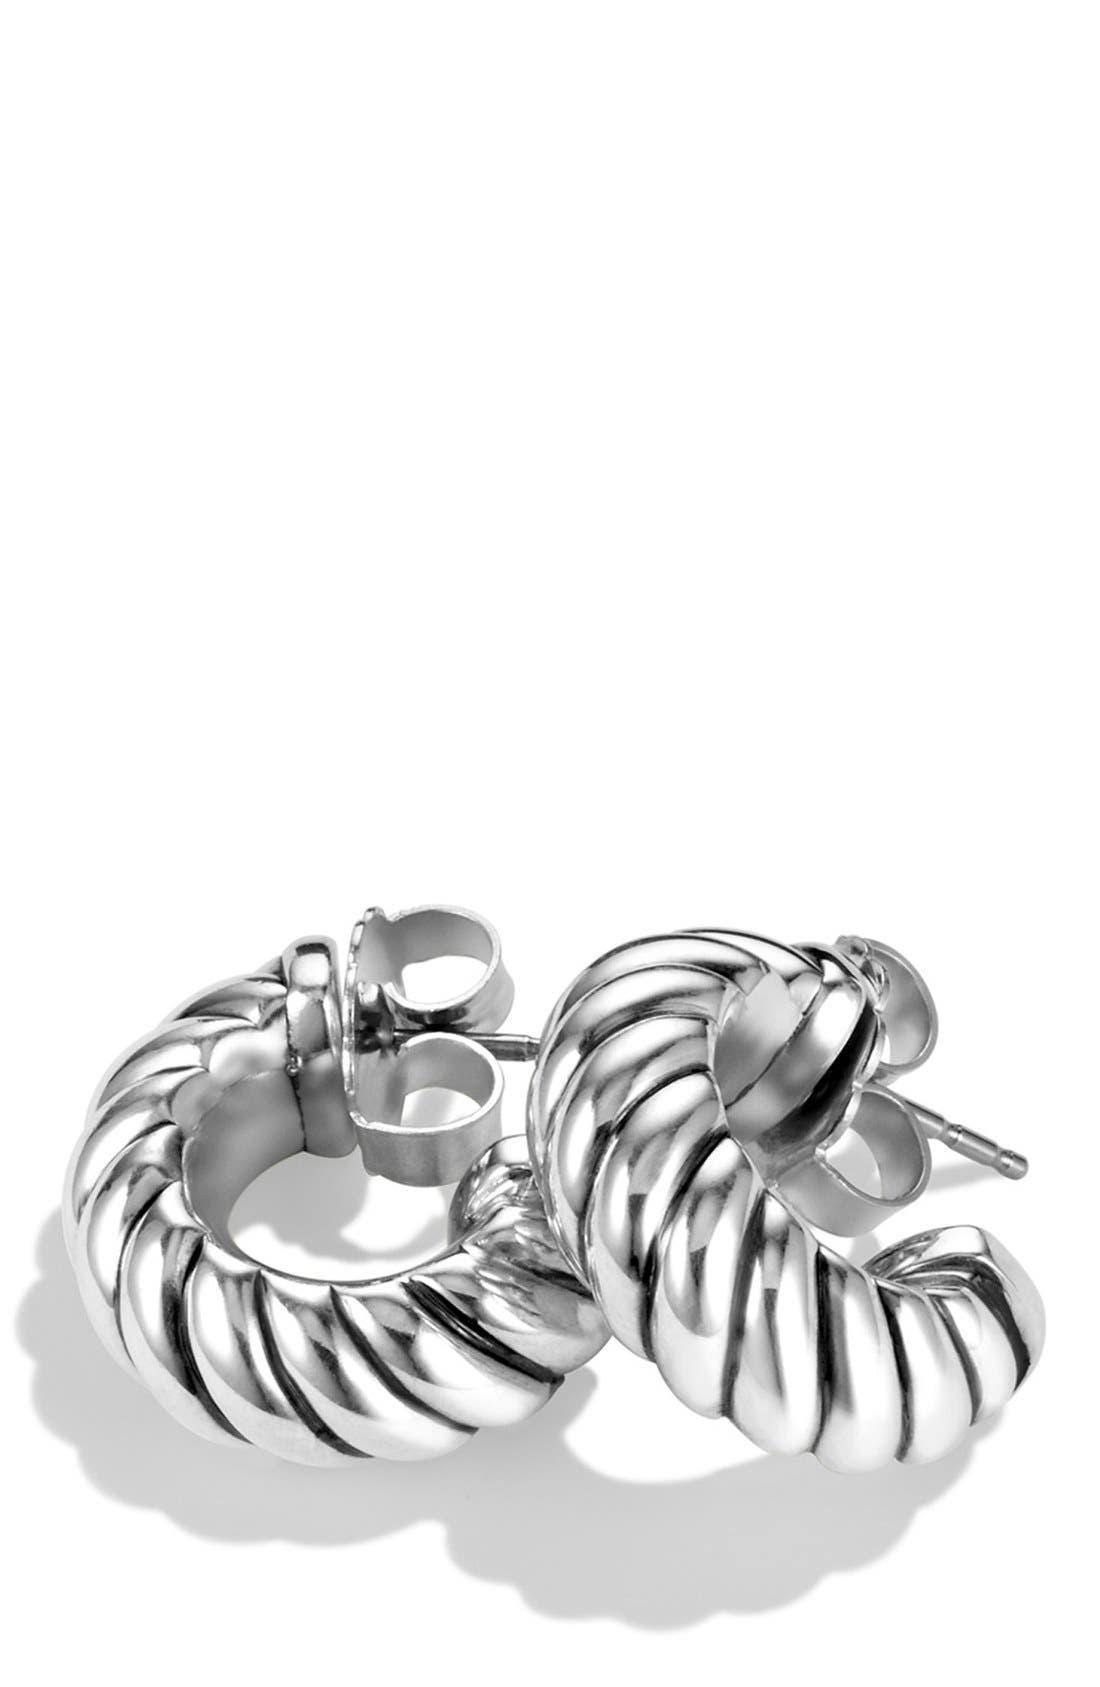 'Cable Classics' Shrimp Earrings,                             Alternate thumbnail 2, color,                             Silver